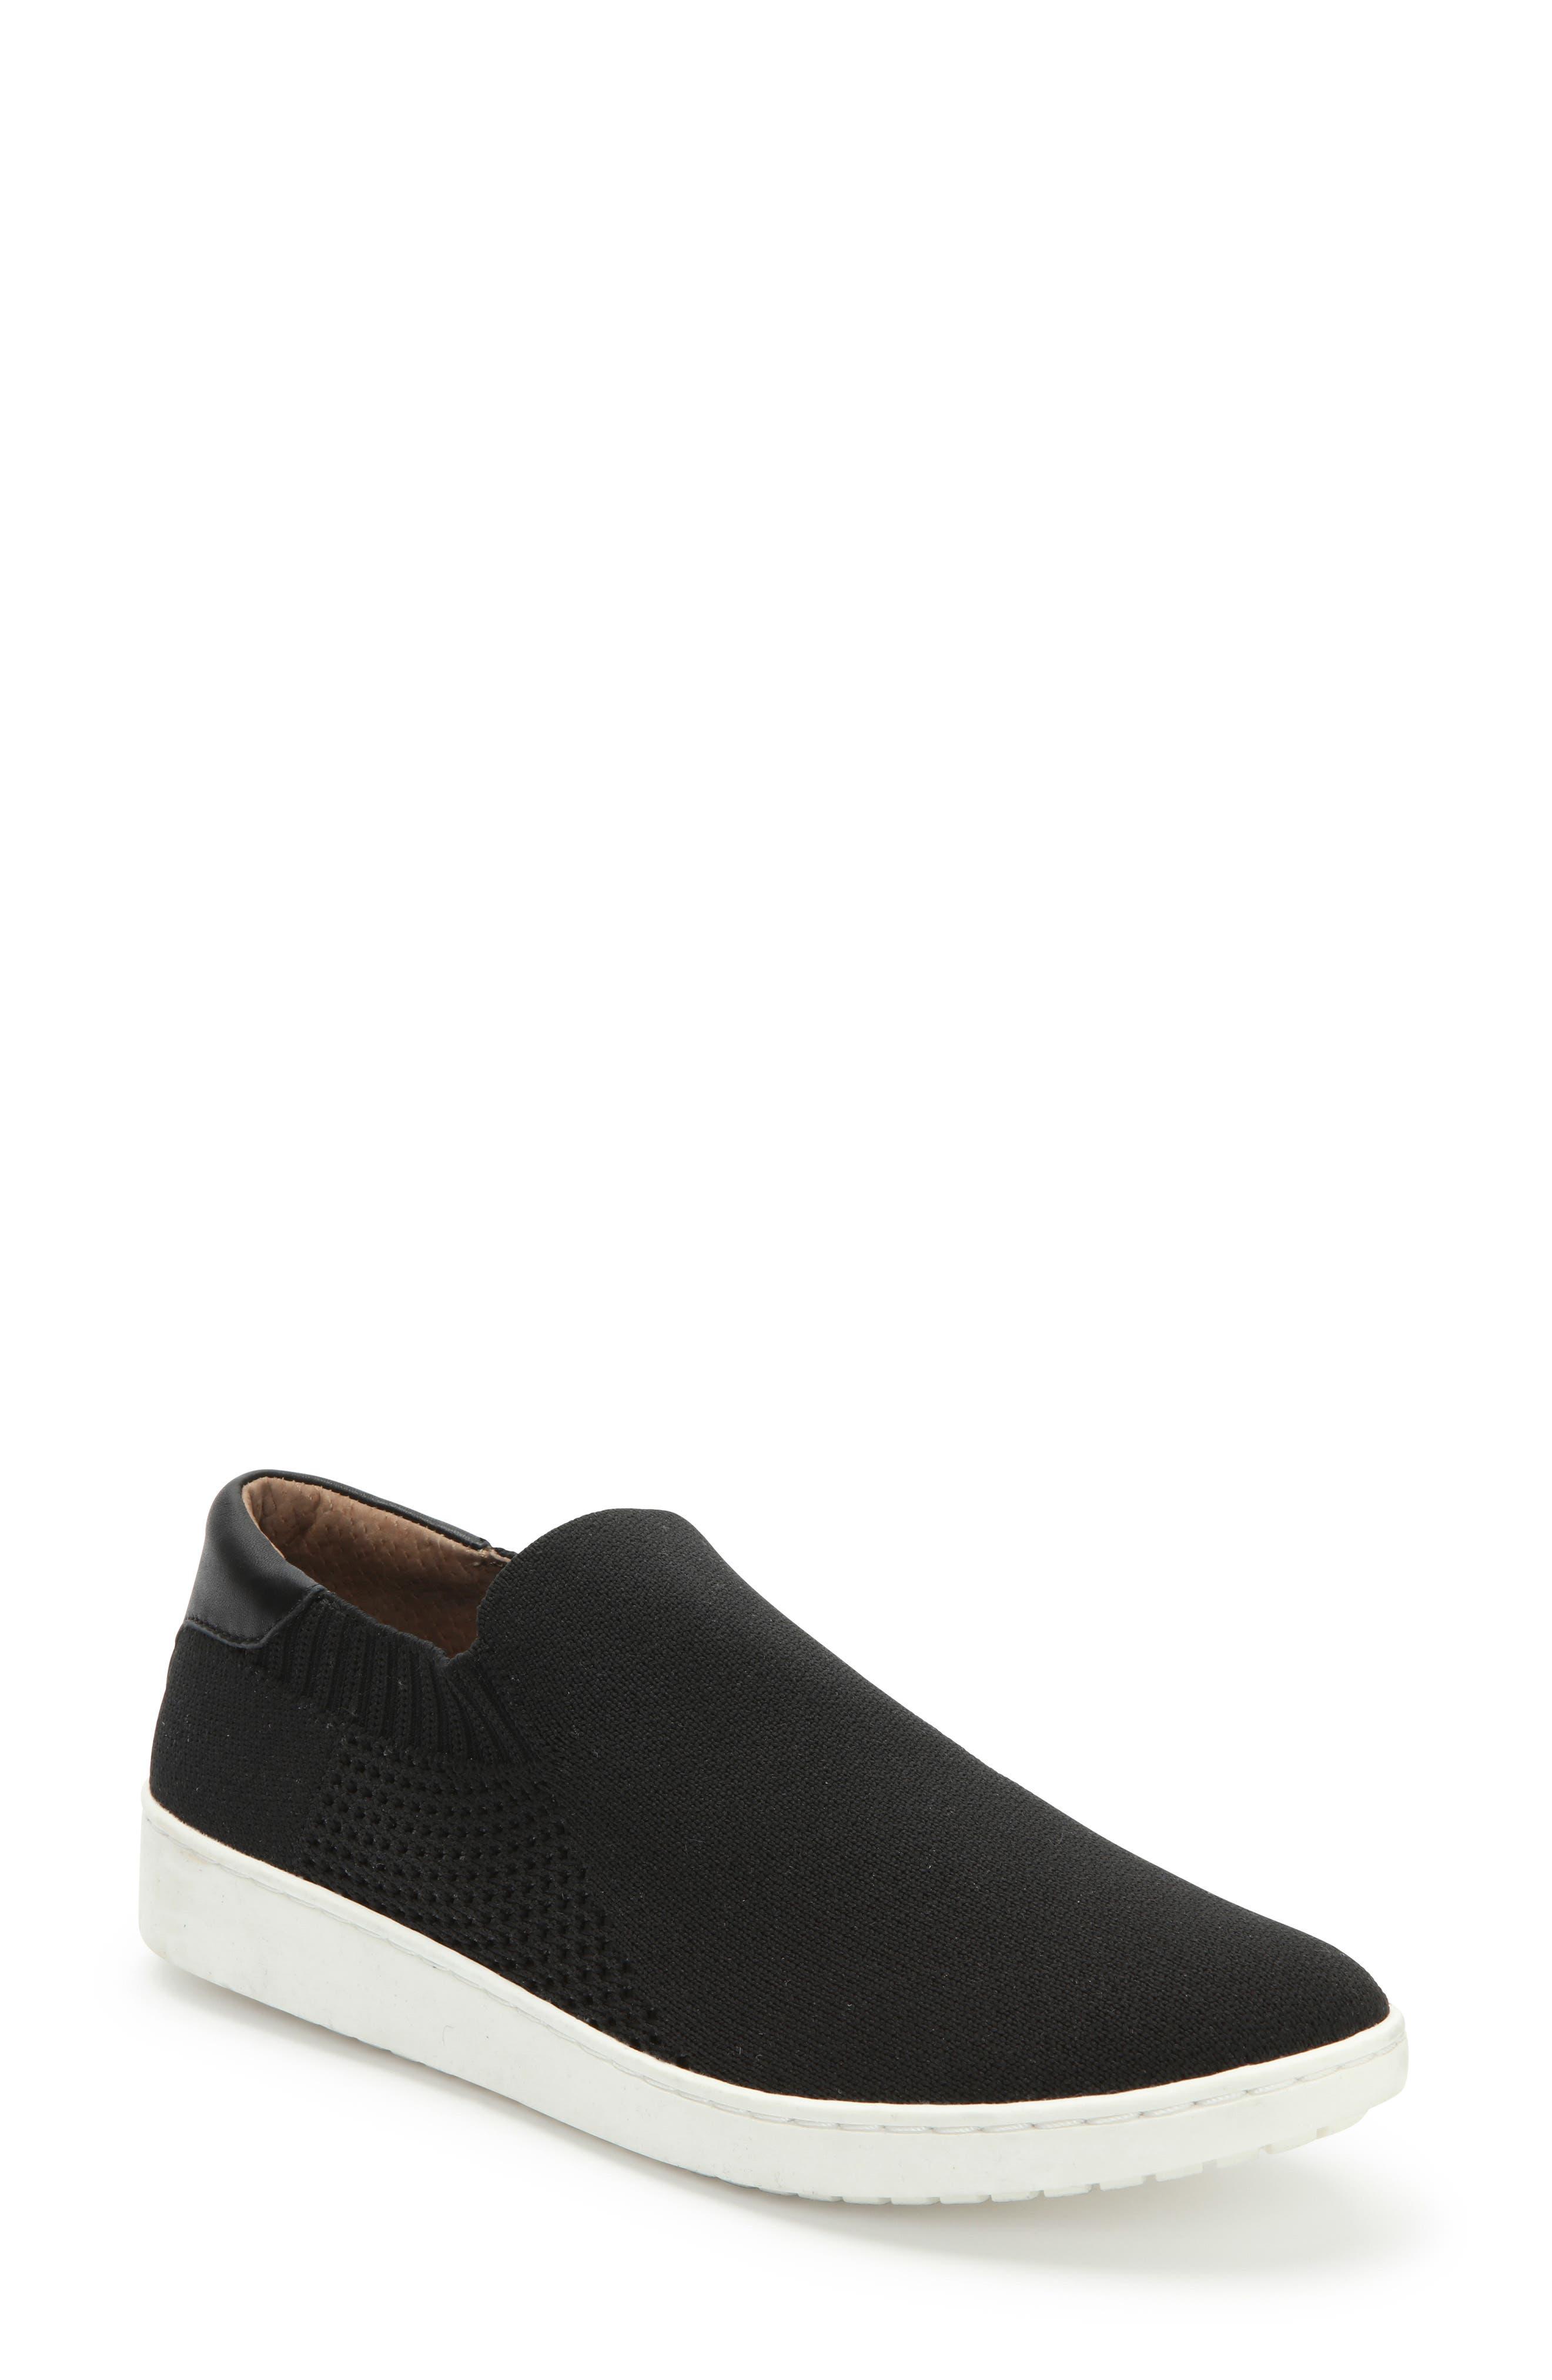 ADAM TUCKER BY ME TOO,                             Adam Tucker Romy Slip-On Sneaker,                             Main thumbnail 1, color,                             BLACK FABRIC